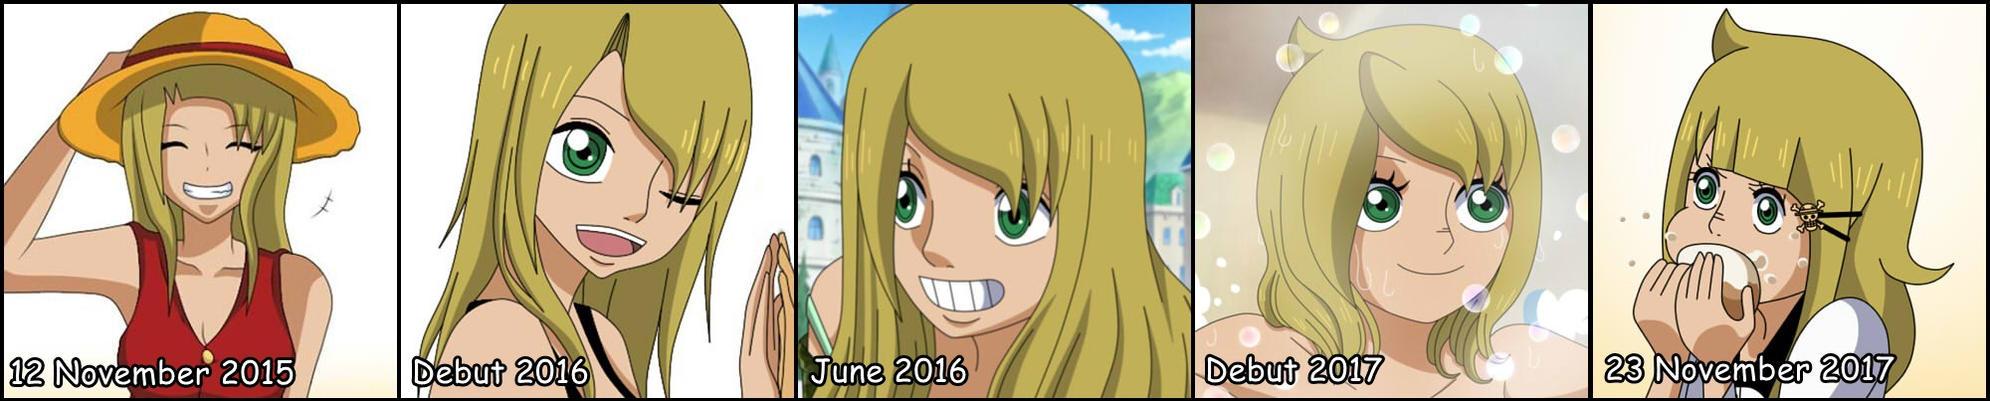 OP OC | Evolution of Erika ! by RosiieChan